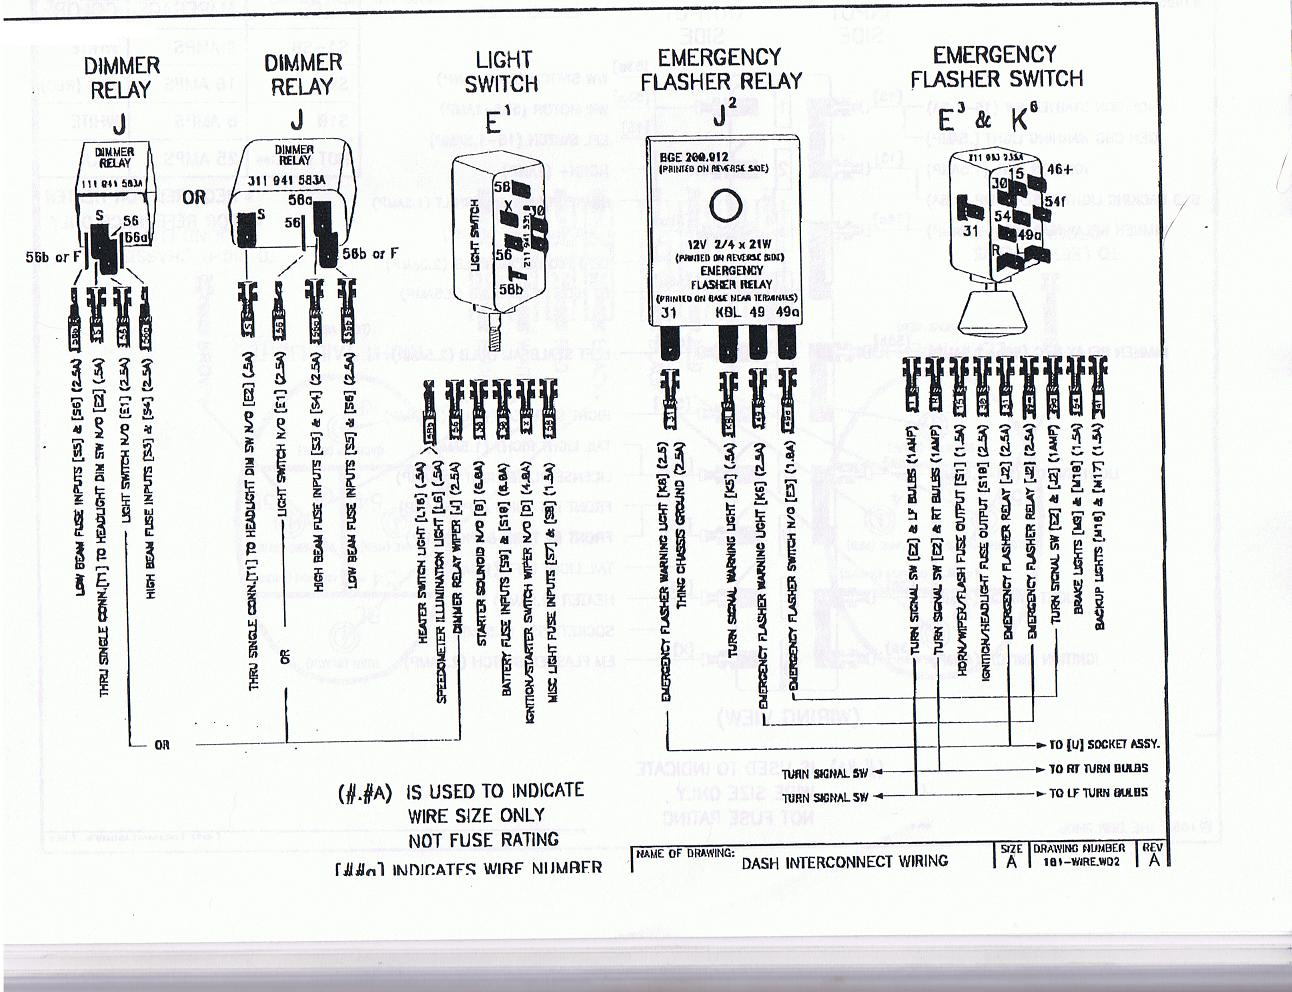 Wiring Diagram For 1973 Vw Thing : 32 Wiring Diagram